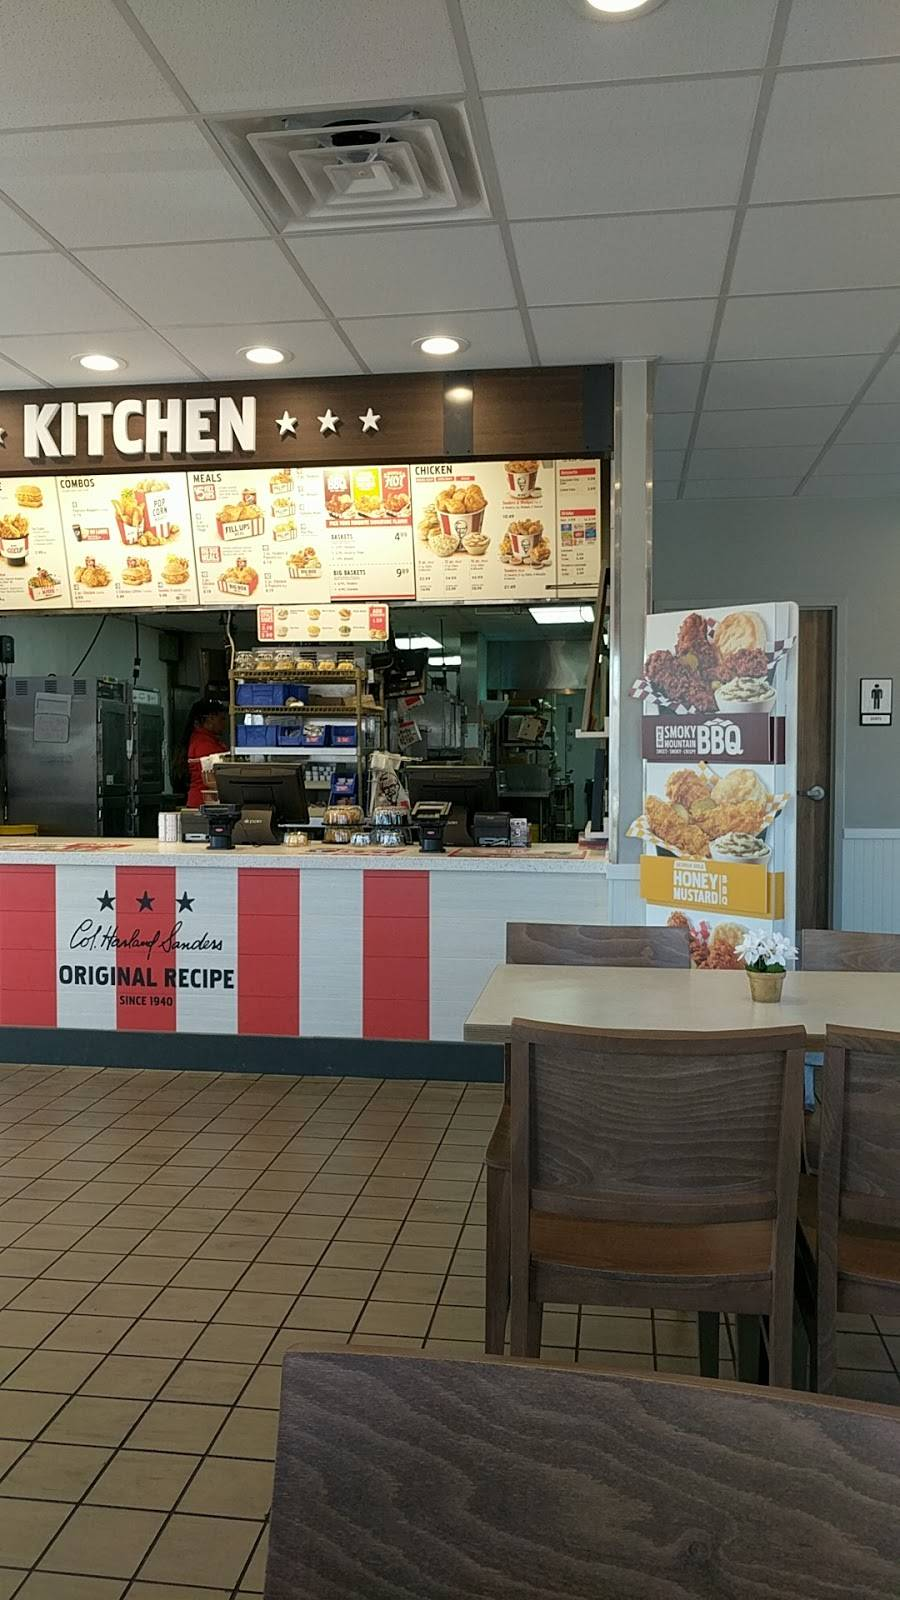 KFC | restaurant | 6665 Crain Hwy, La Plata, MD 20646, USA | 3019340374 OR +1 301-934-0374